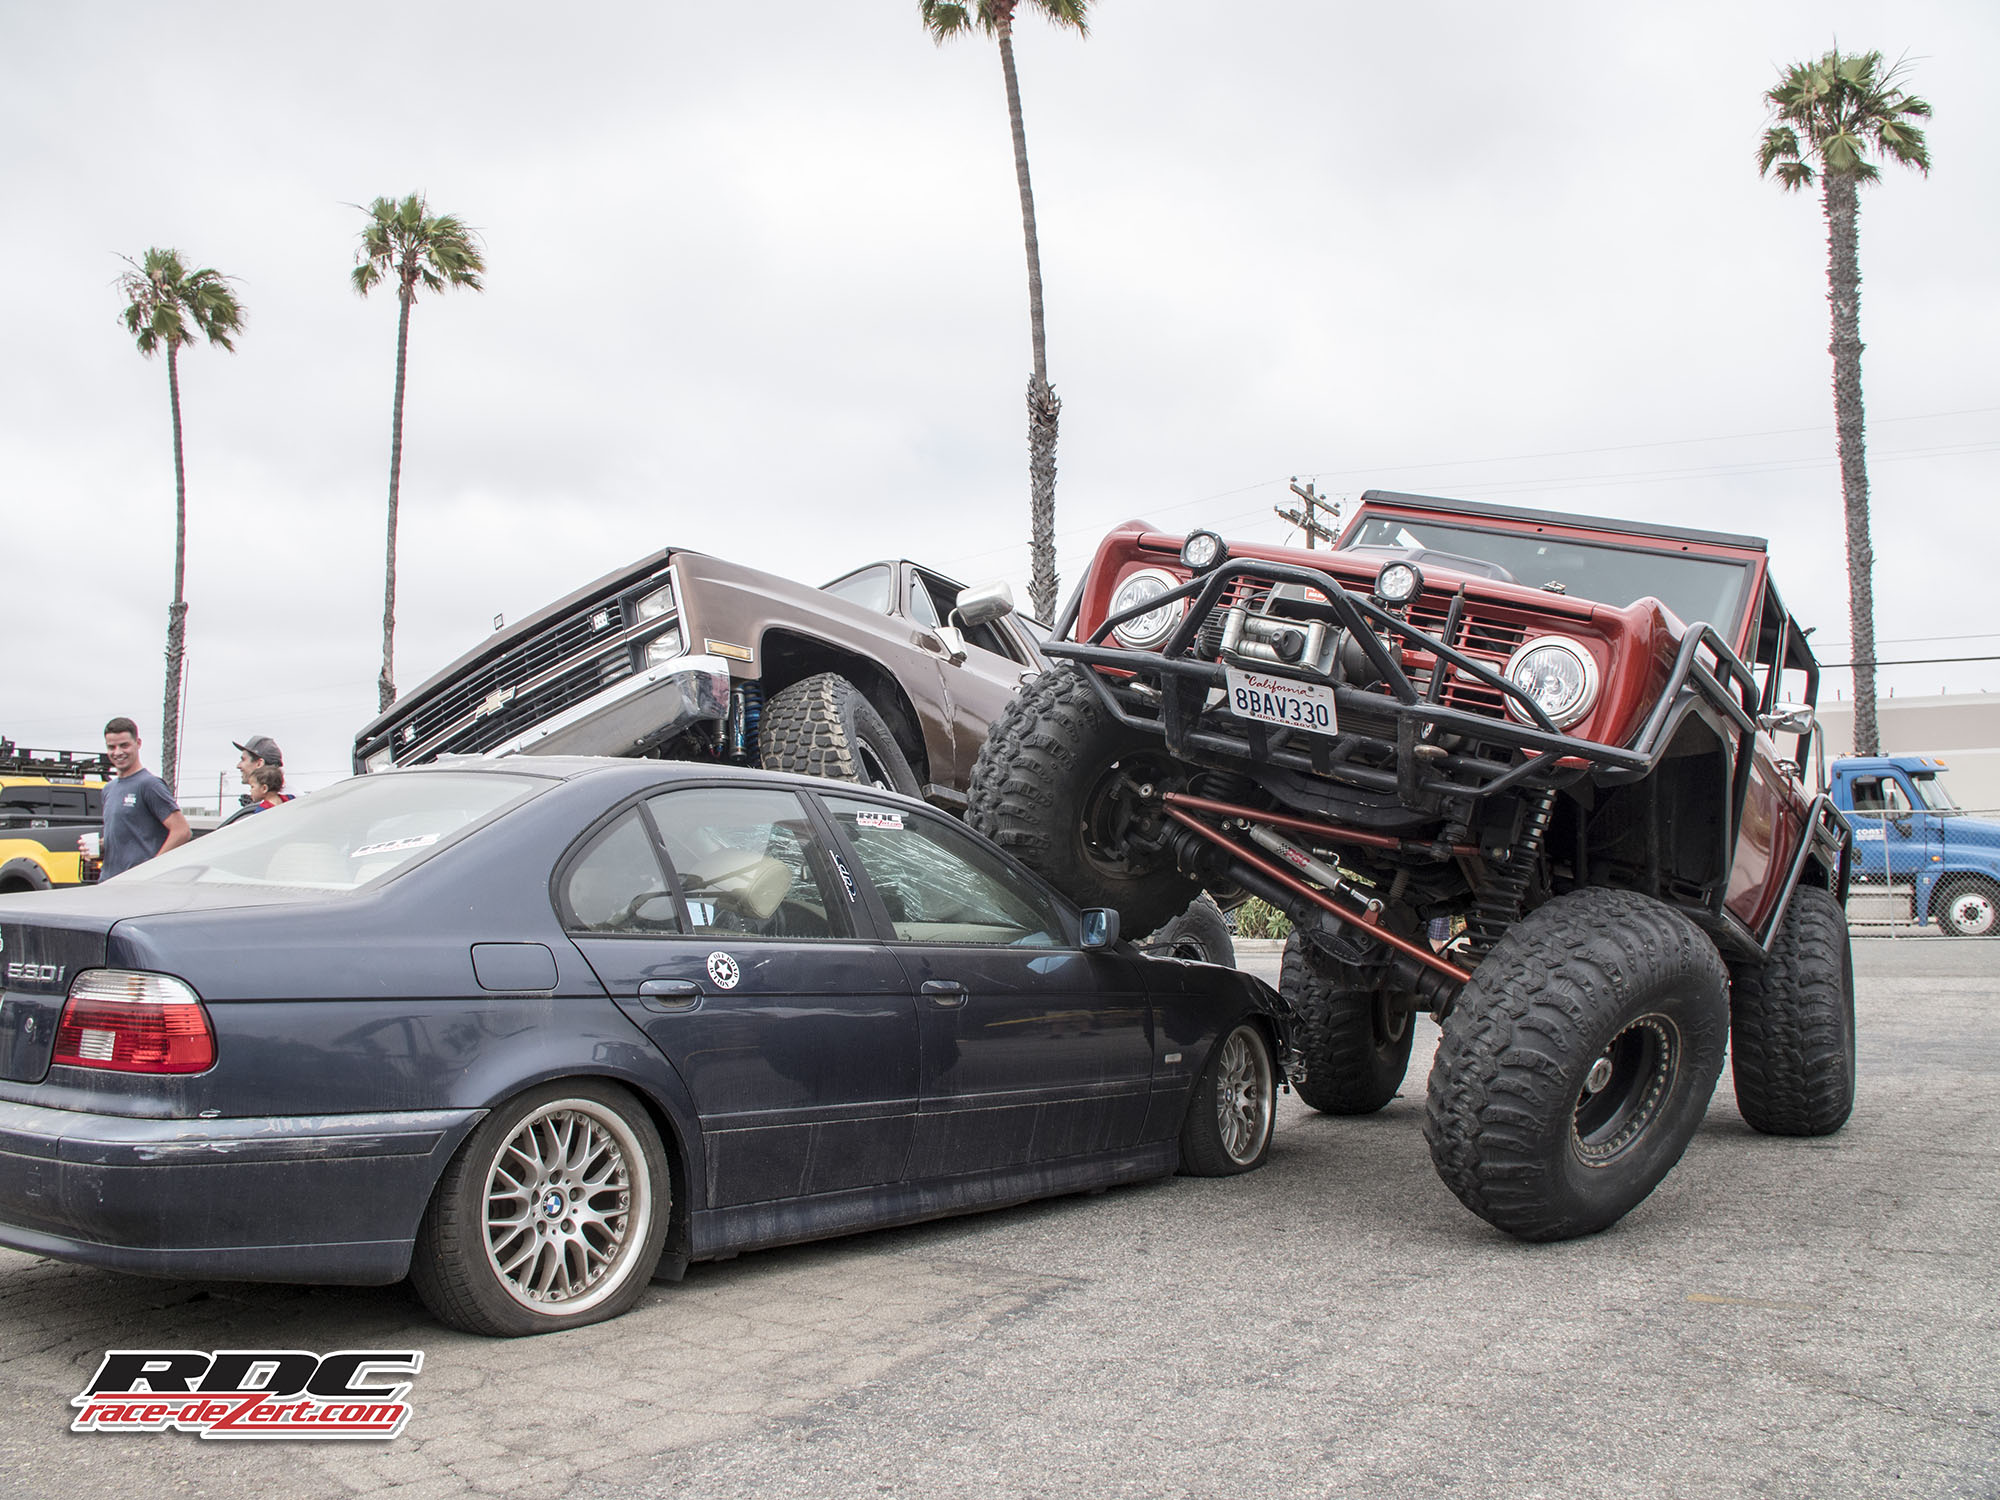 2018-fuel-the-desert-race-dezert_09.jpg